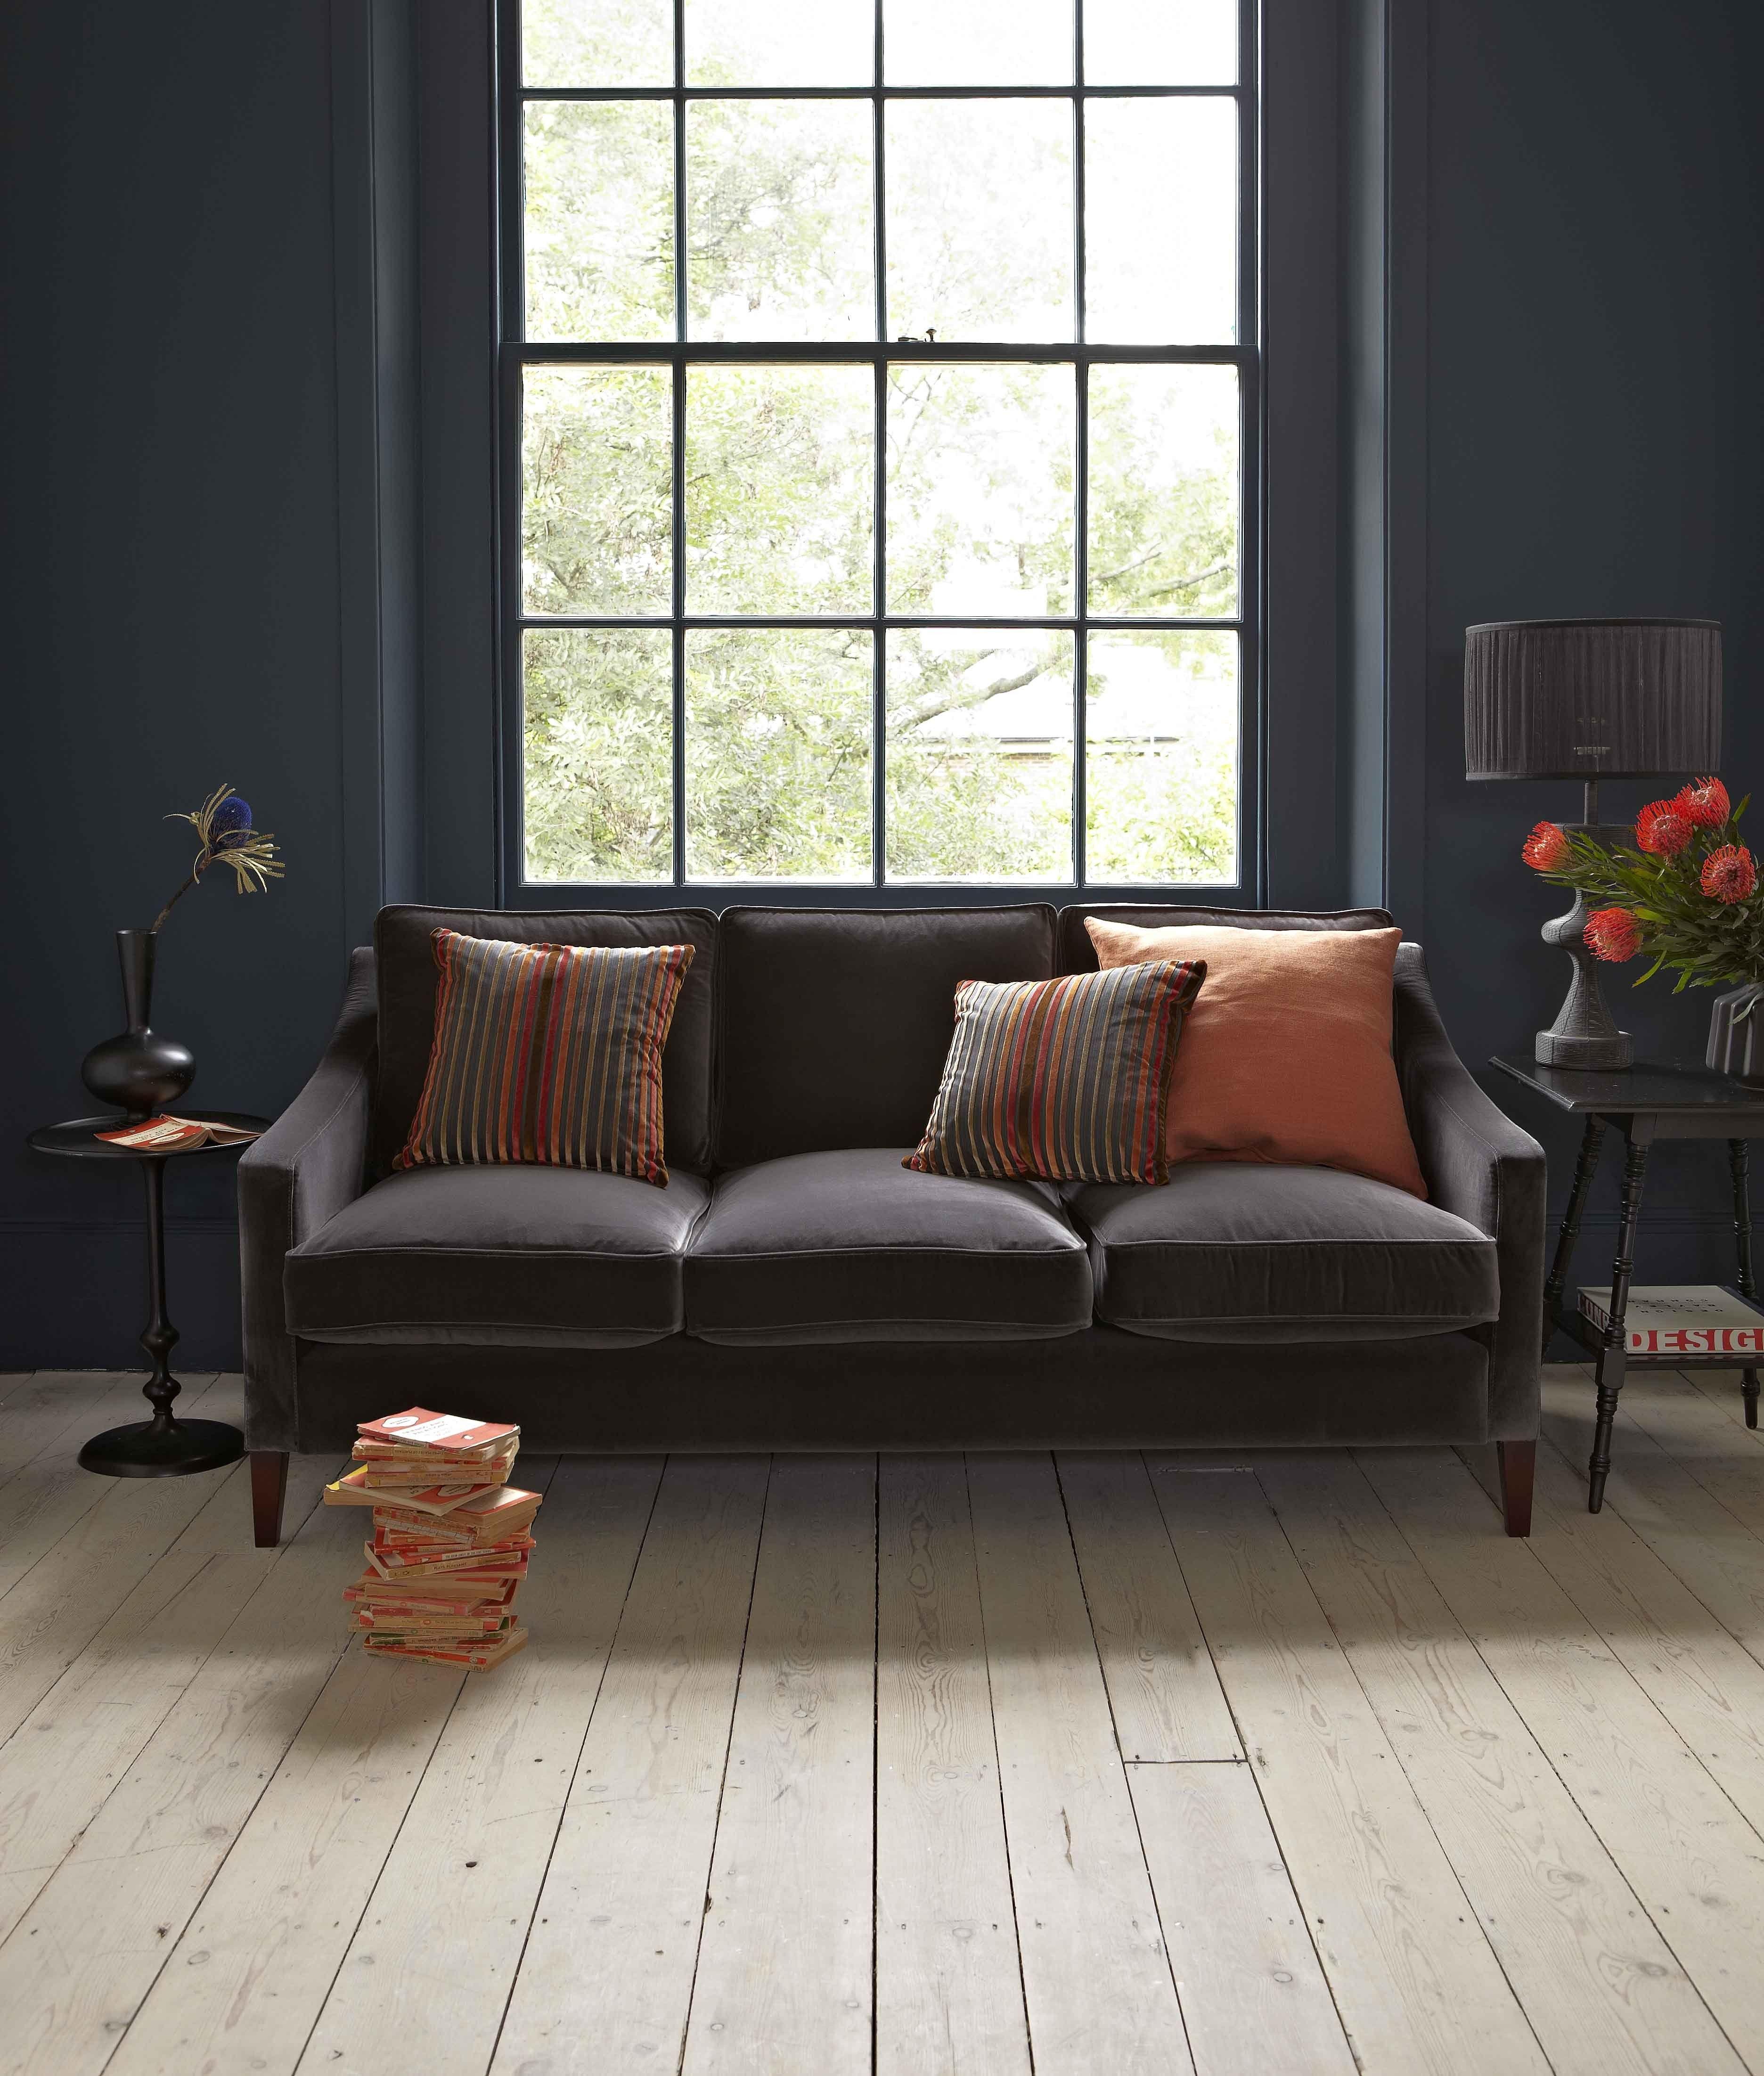 Sectional Sofas Nyc Showroom Narrow Sofa Tables Canada Com Okaycreations Thesofa